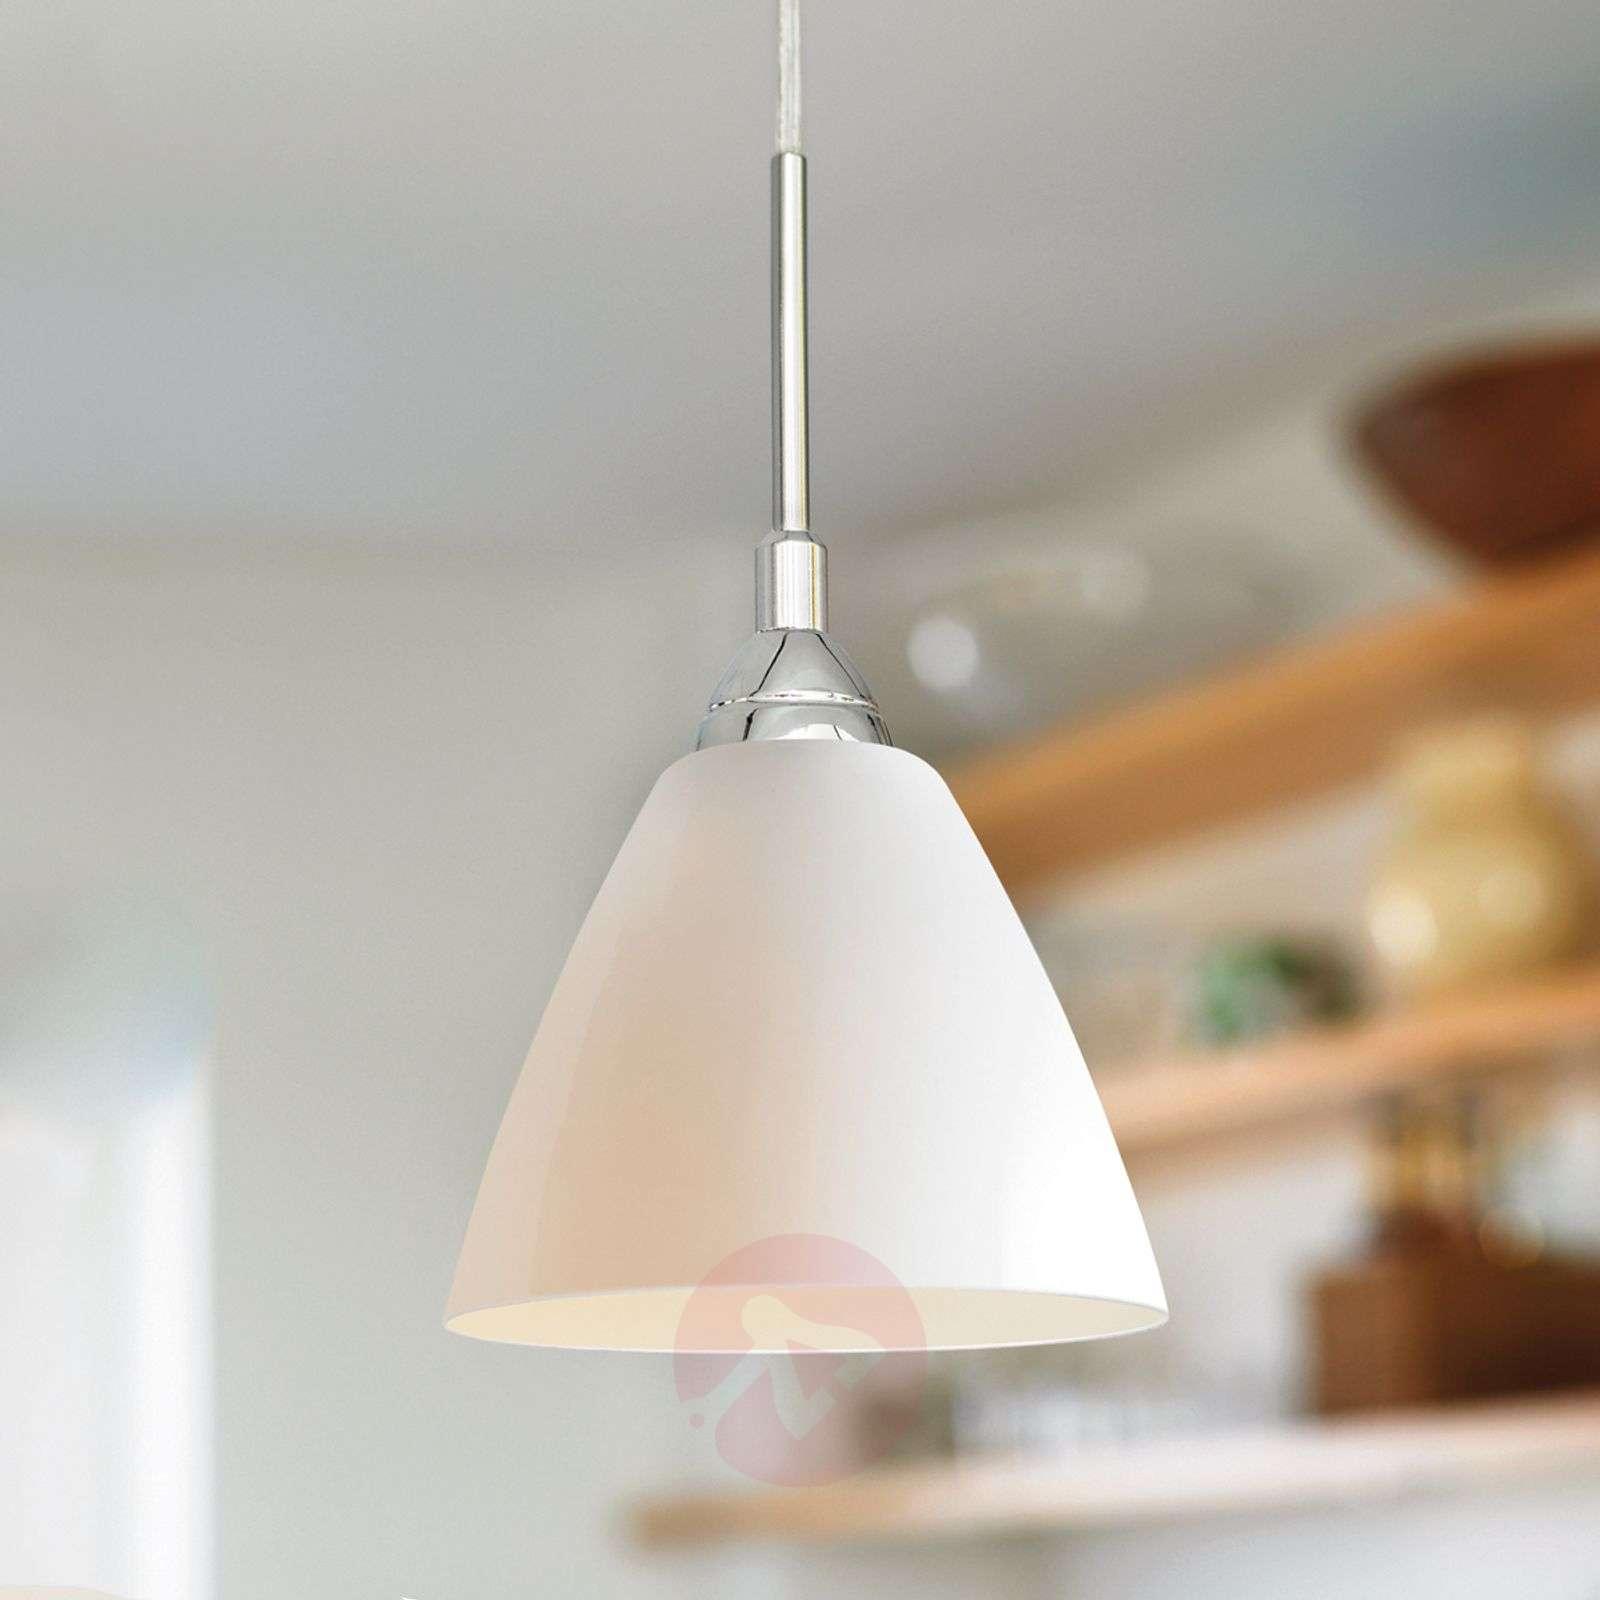 Glass Read hanging light, 14 cm-7005920-01